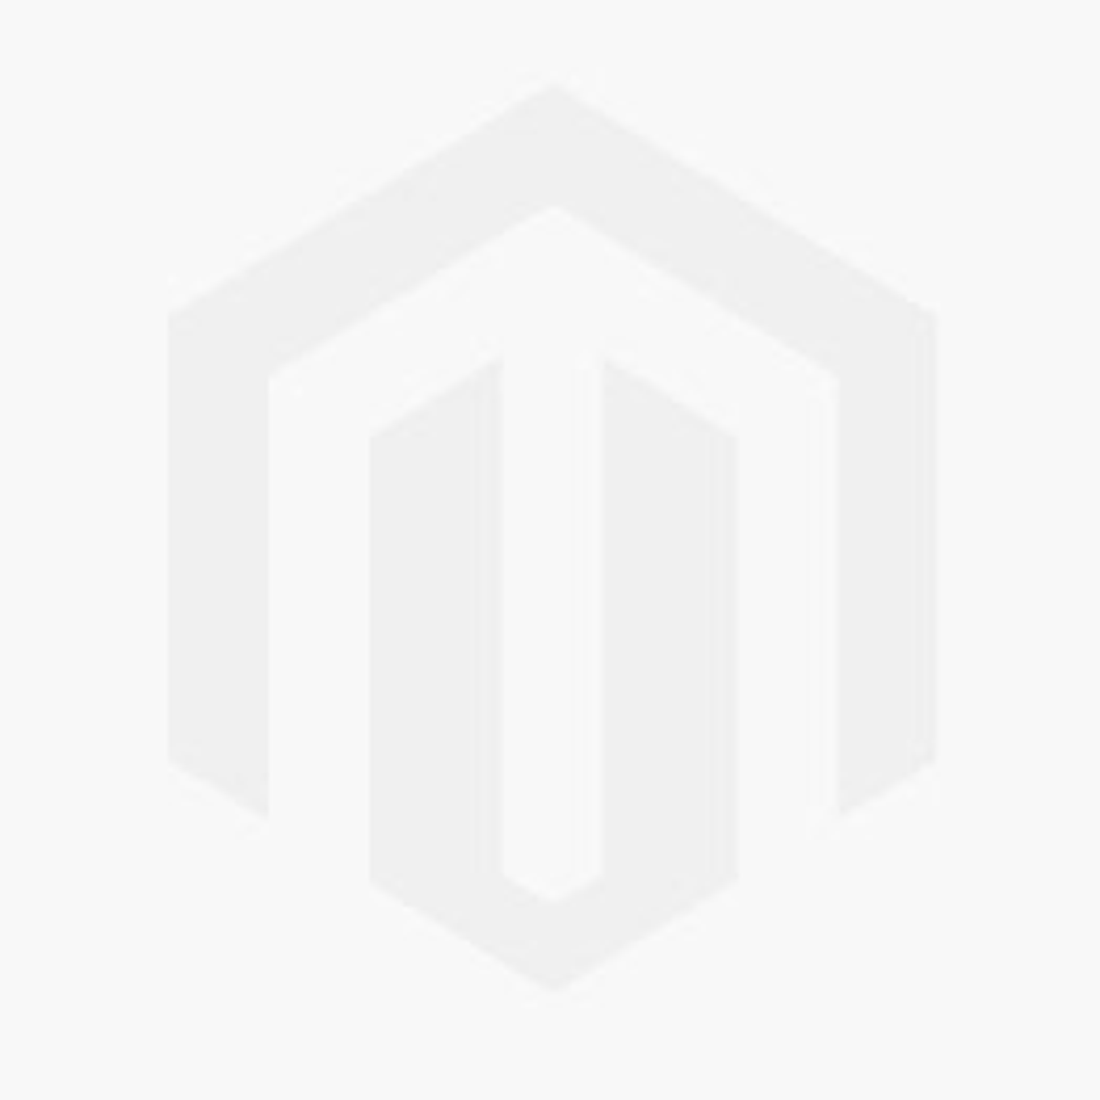 Albert Irvin OBE RA Untitled opus w.28